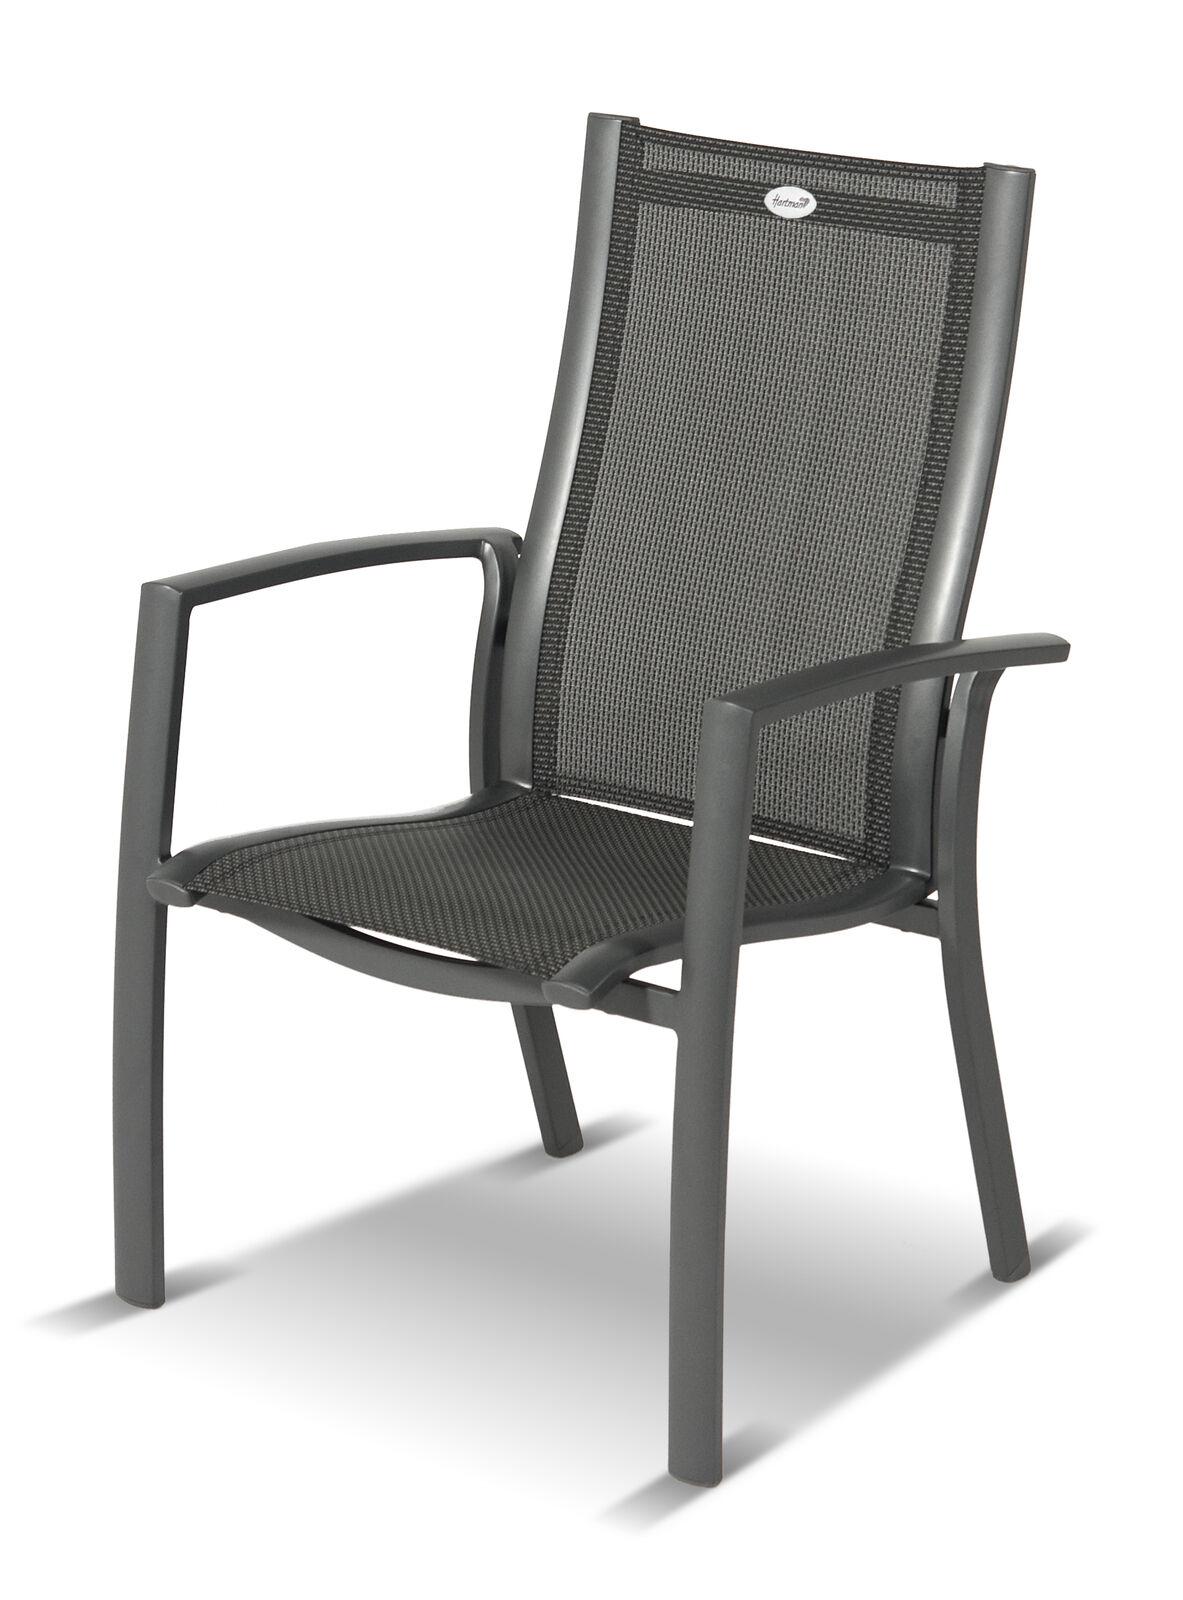 Aluminium Stapelstuhl.садовый стул или кресло Hartman Belcampo Dining Ii Stapelstuhl Aluminium